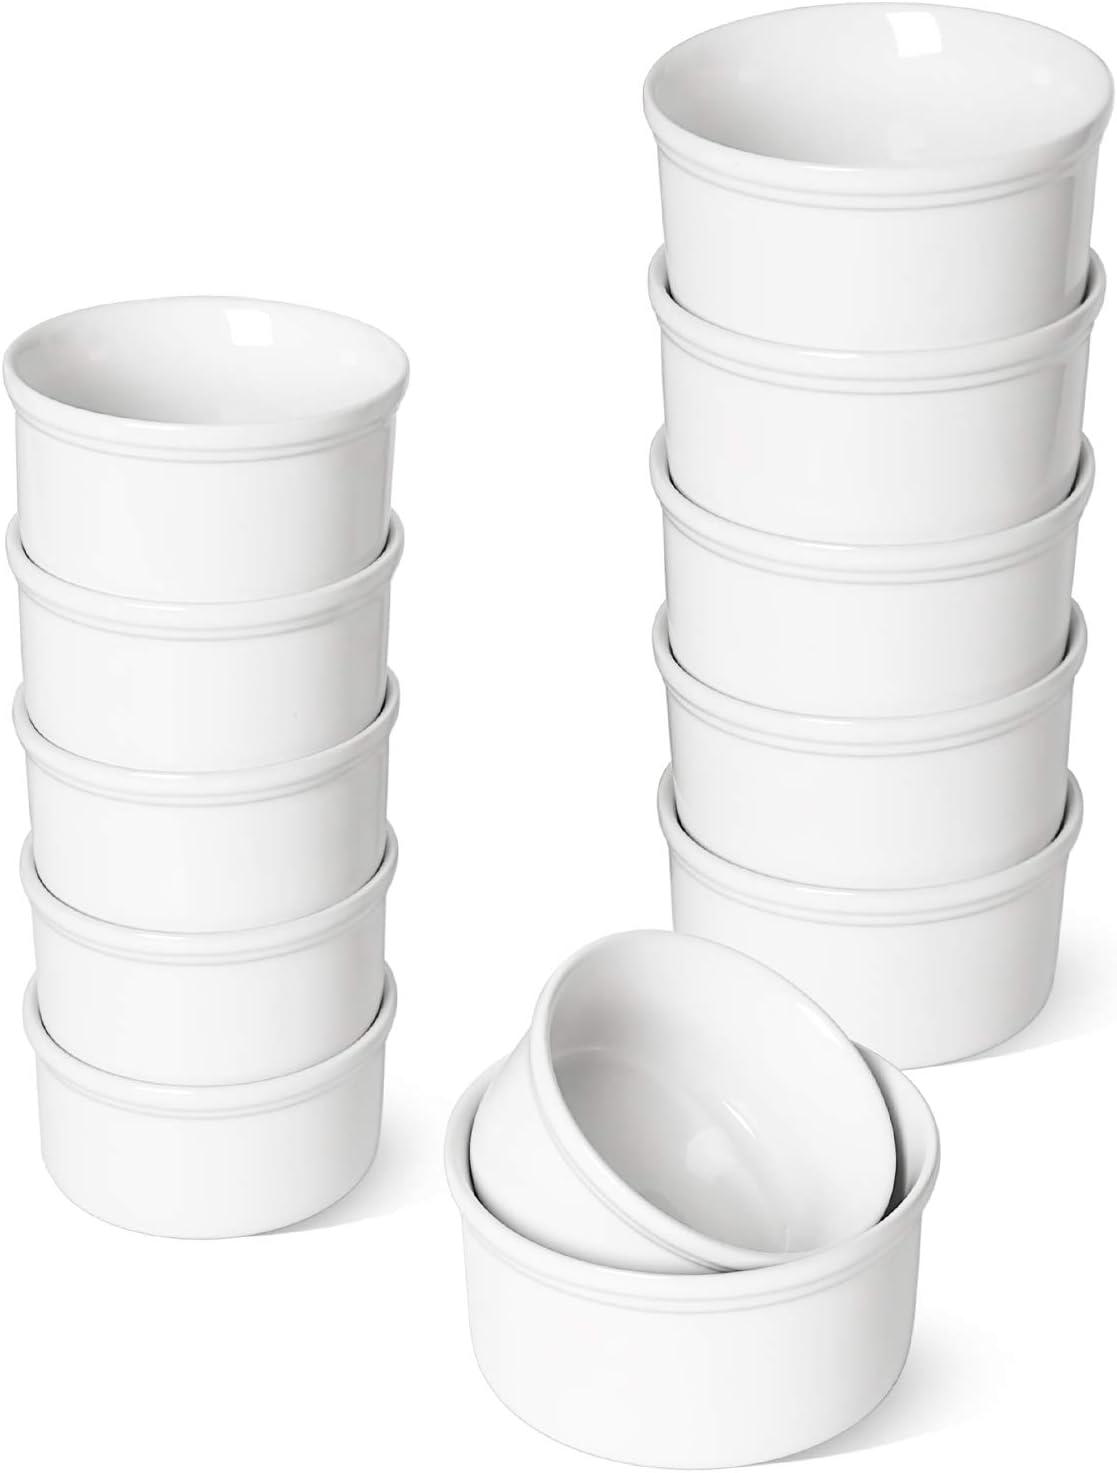 Mesa Mall LE TAUCI 12 Pack Ramekins Free Shipping Cheap Bargain Gift Oz x Bakeware 6 Pcs